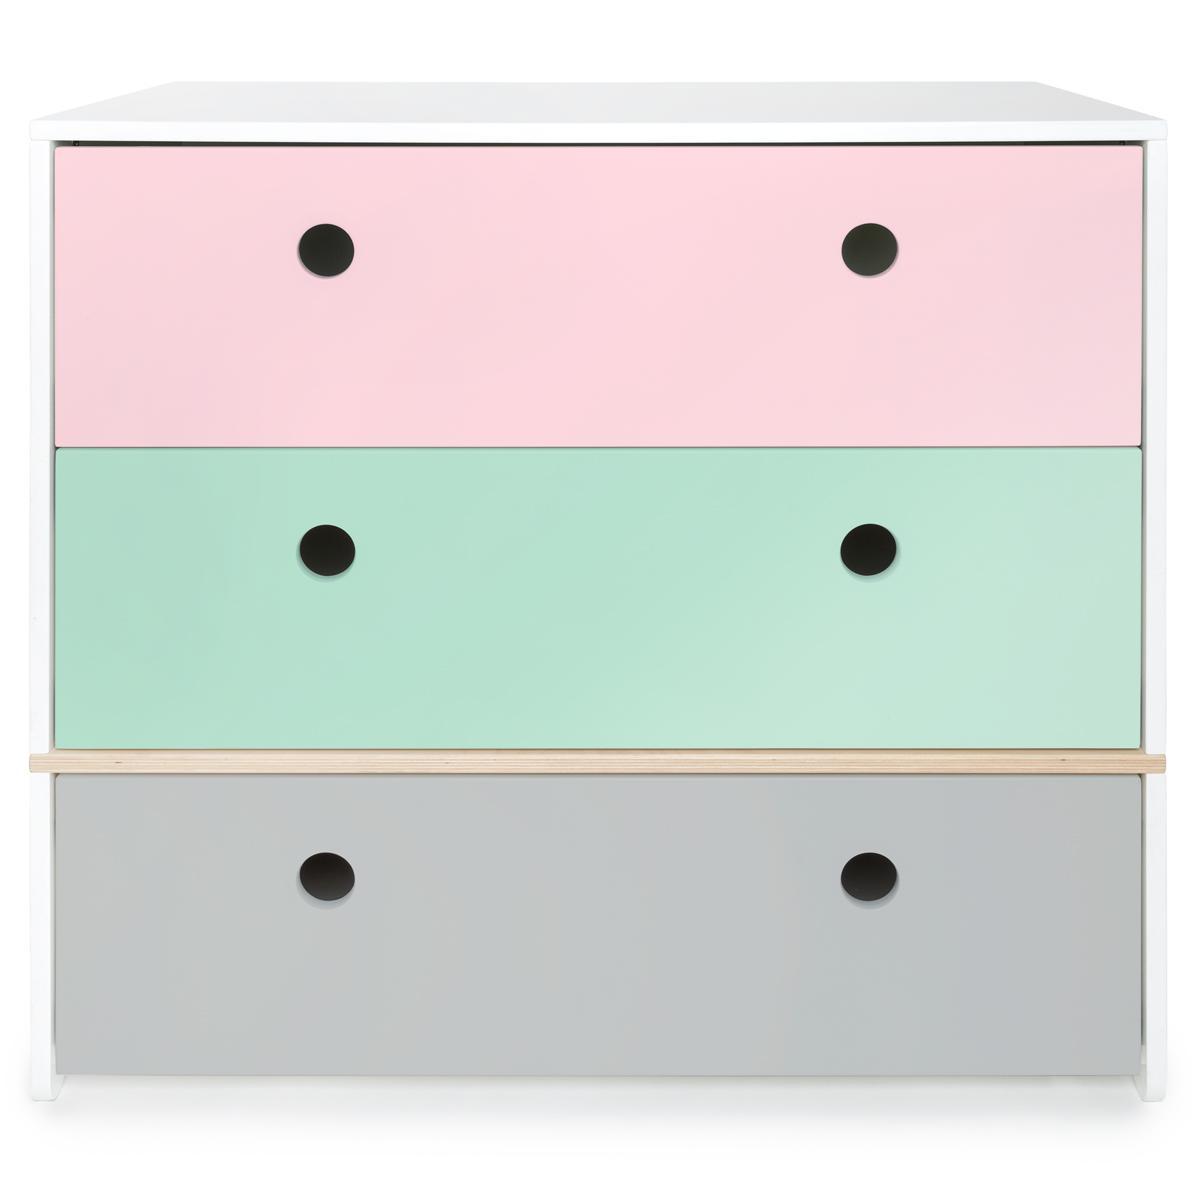 Kommode COLORFLEX Schubladen Farben sweet pink-mint-pearl grey